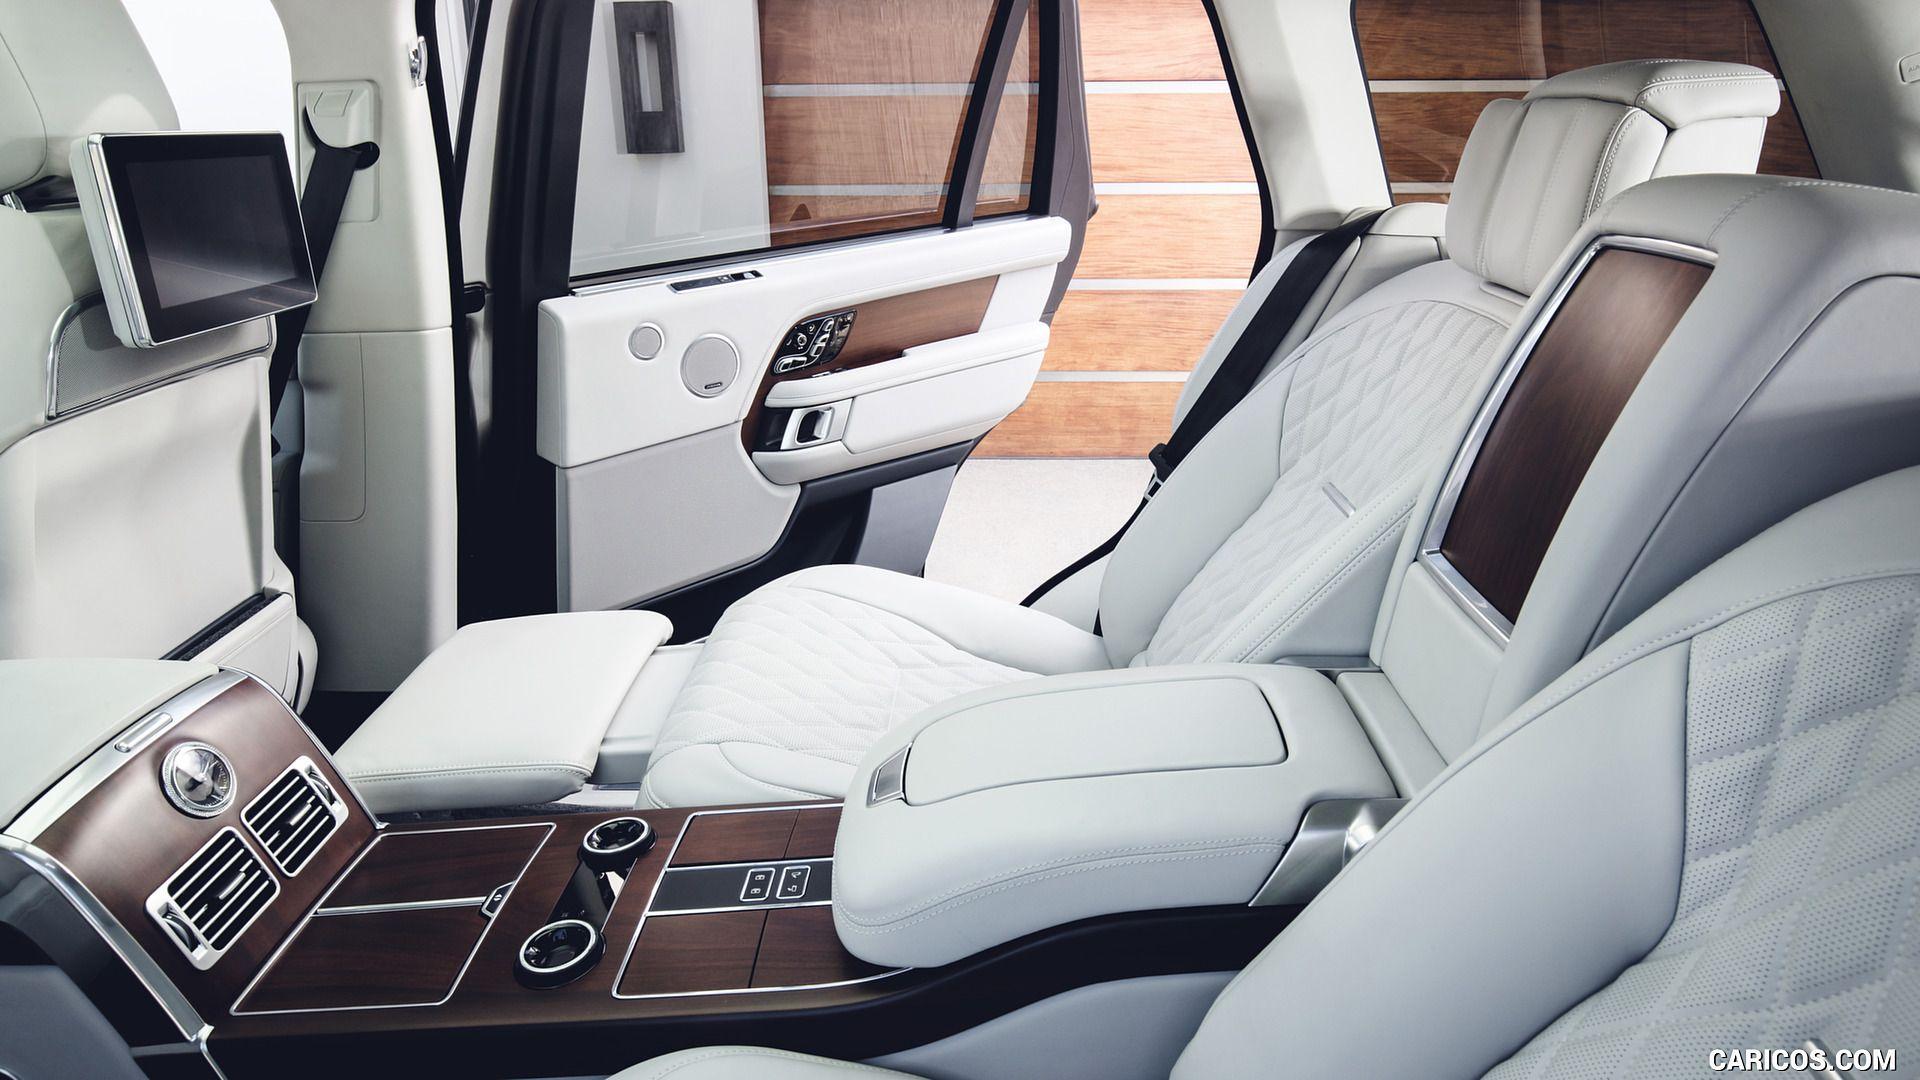 Photo of 2019 Range Rover P400e Plug-in Hybrid – Interior, Rear Seats HD